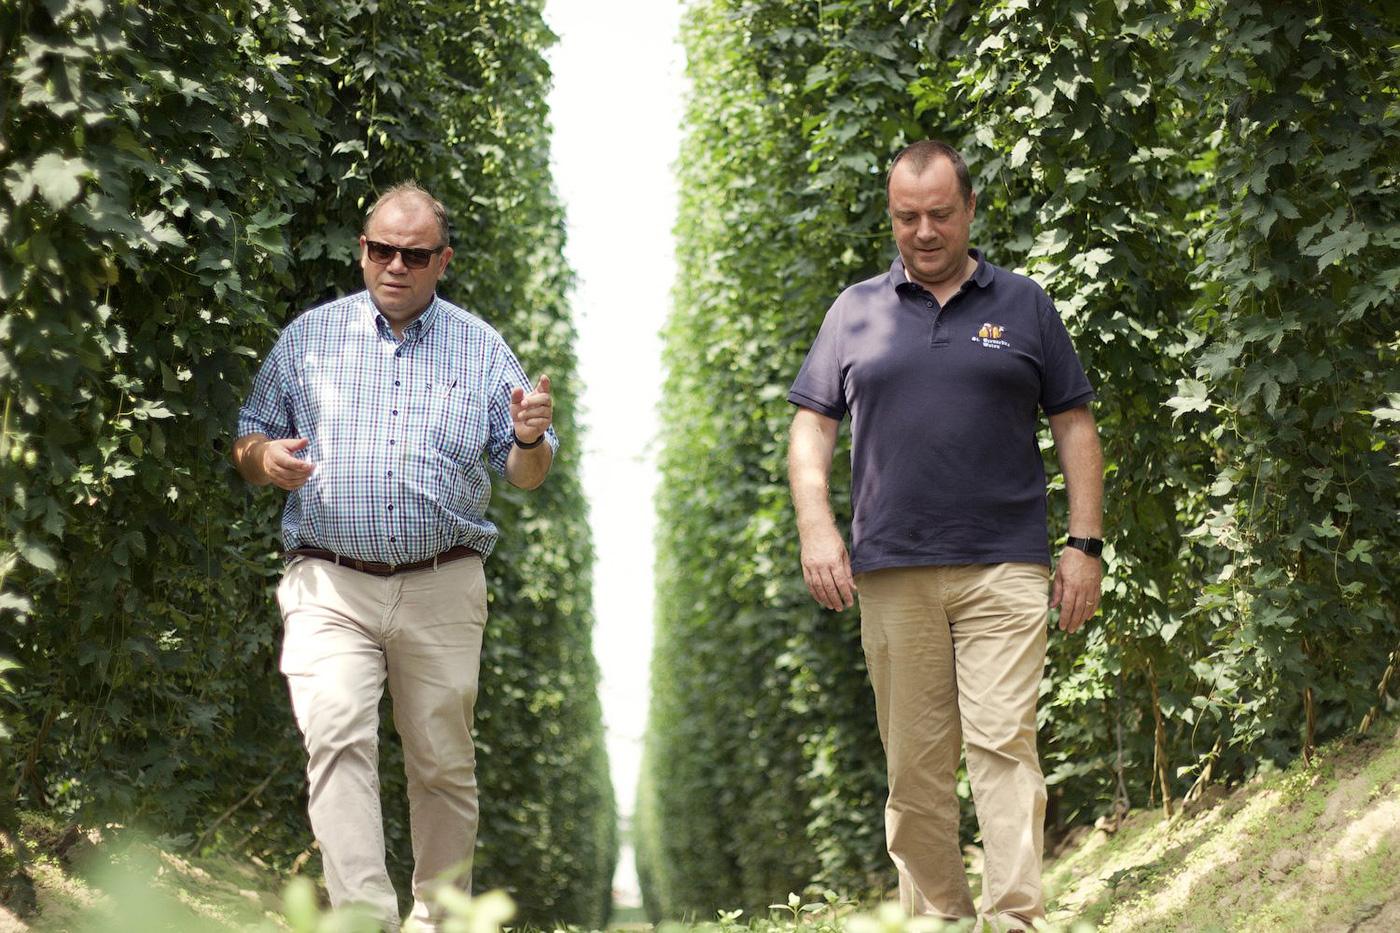 Владелец пивоварни Brouwerij St. Bernardus Ханс Депипере и директор по маркетингу и продажам Марко Пассарелла. Фото: Breandán Kearney